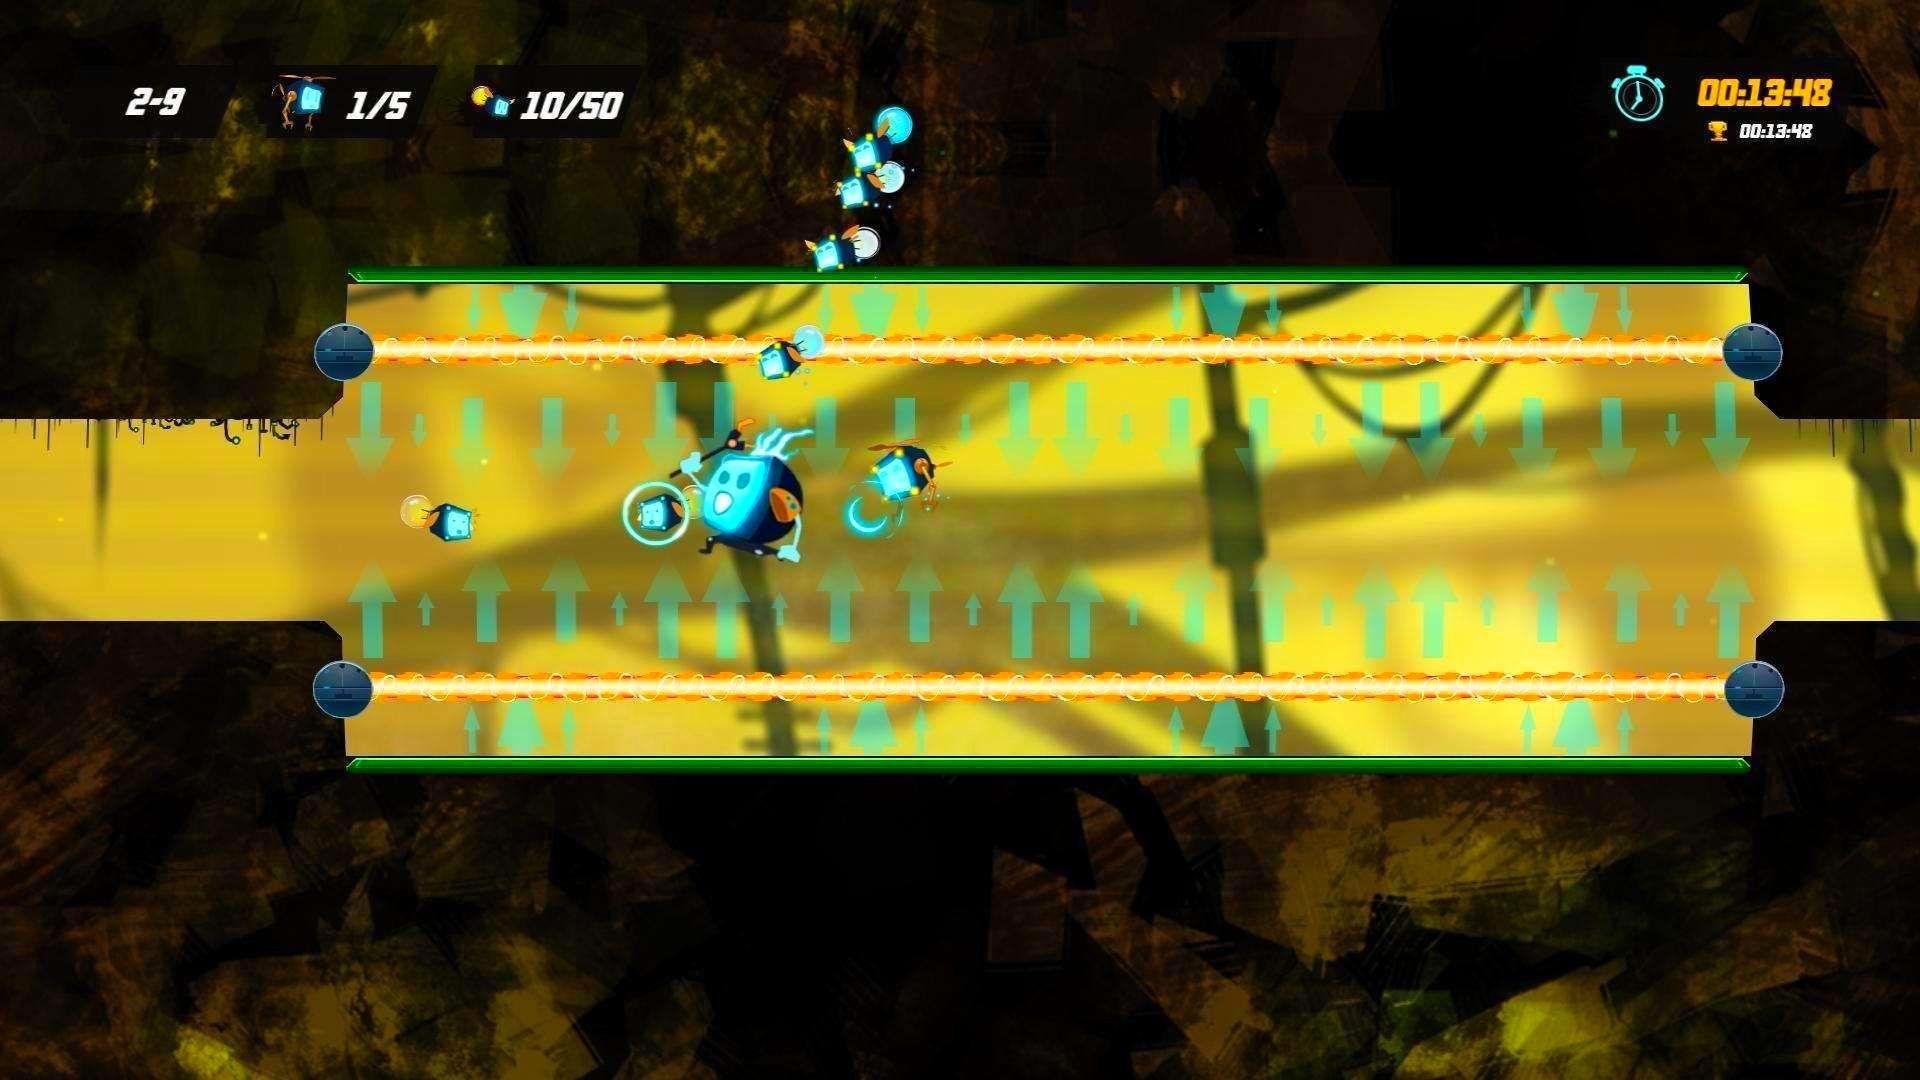 Screenshot from Mechanic Escape (2/5)